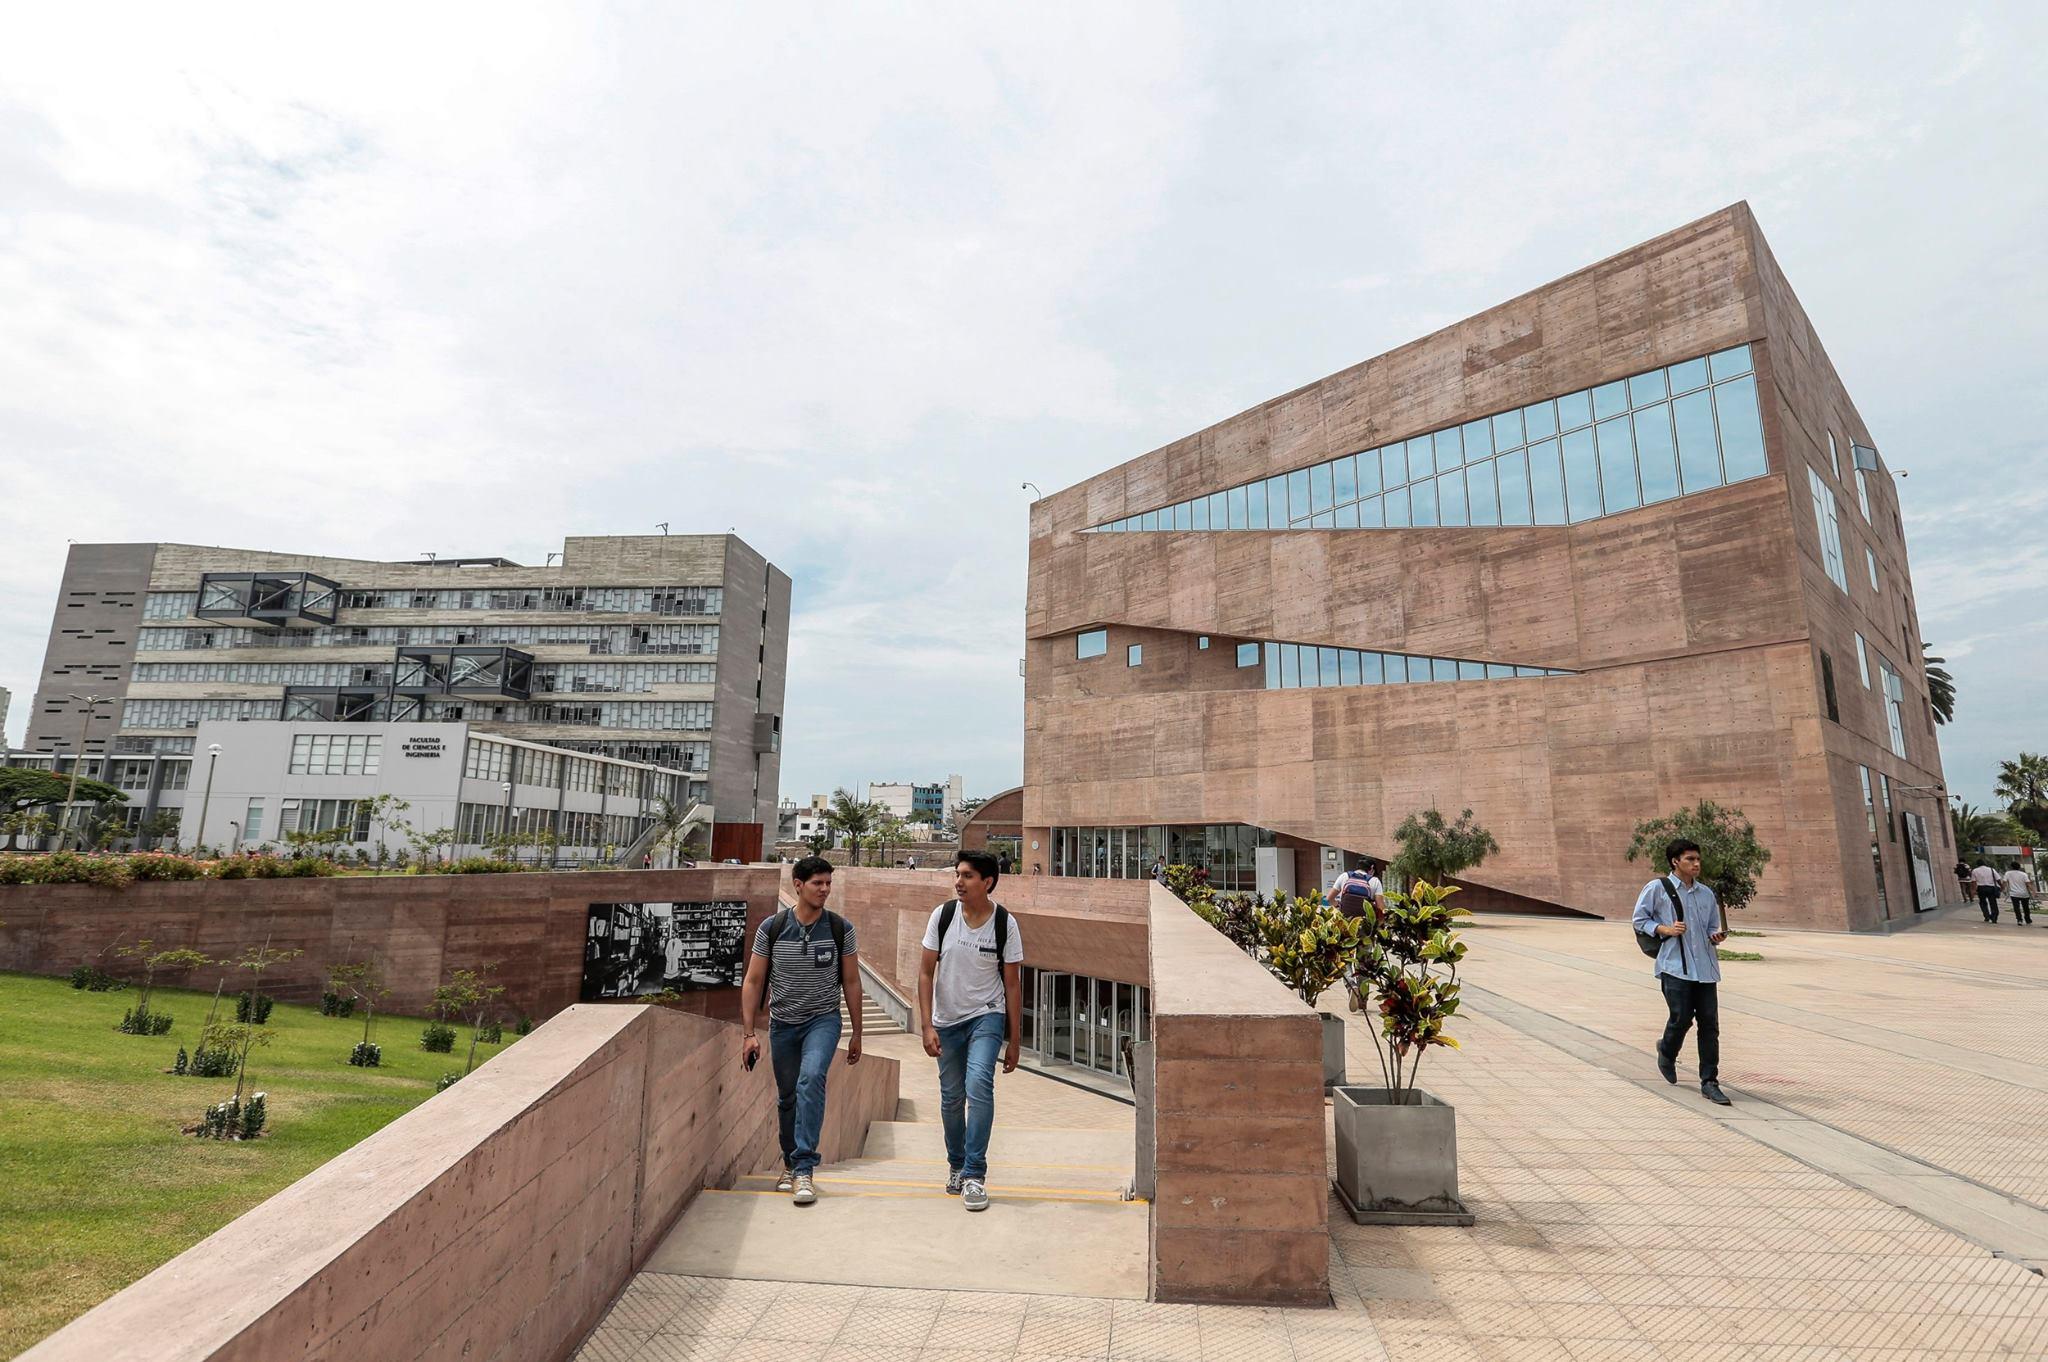 Pontificia Universidad Católica del Perú - PUCP Campus